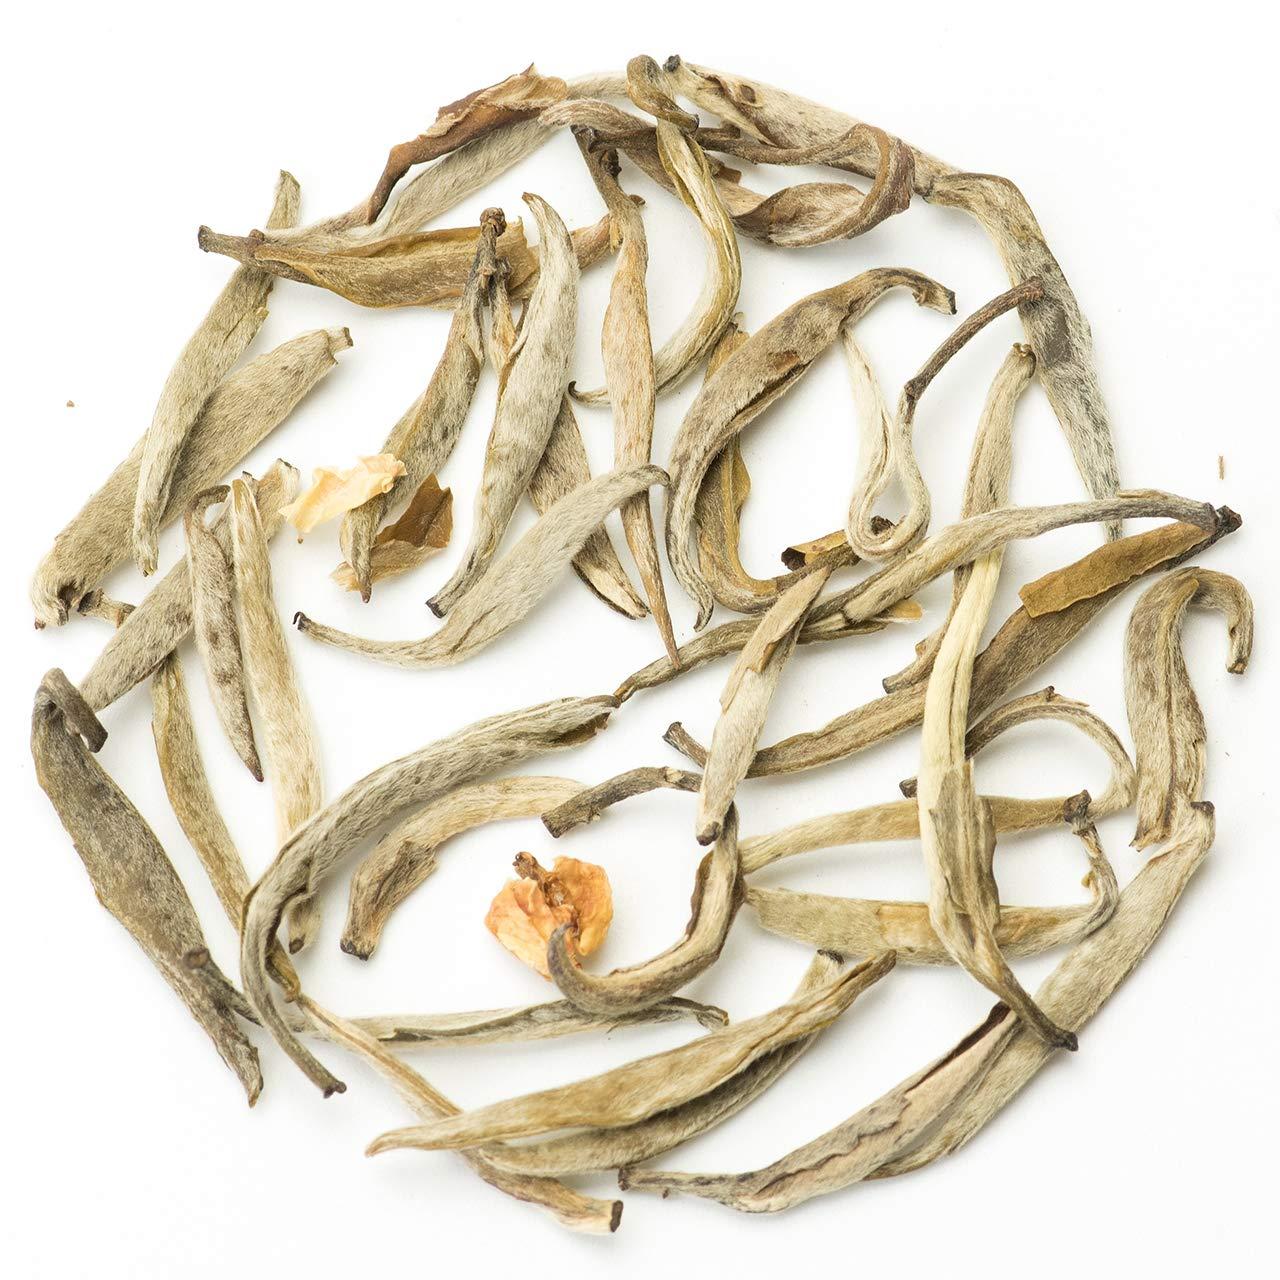 Teavivre Jasmine Silver Needle White Tea (Mo Li Yin Zhen) Loose Leaf Chinese Tea - 3.5oz / 100g